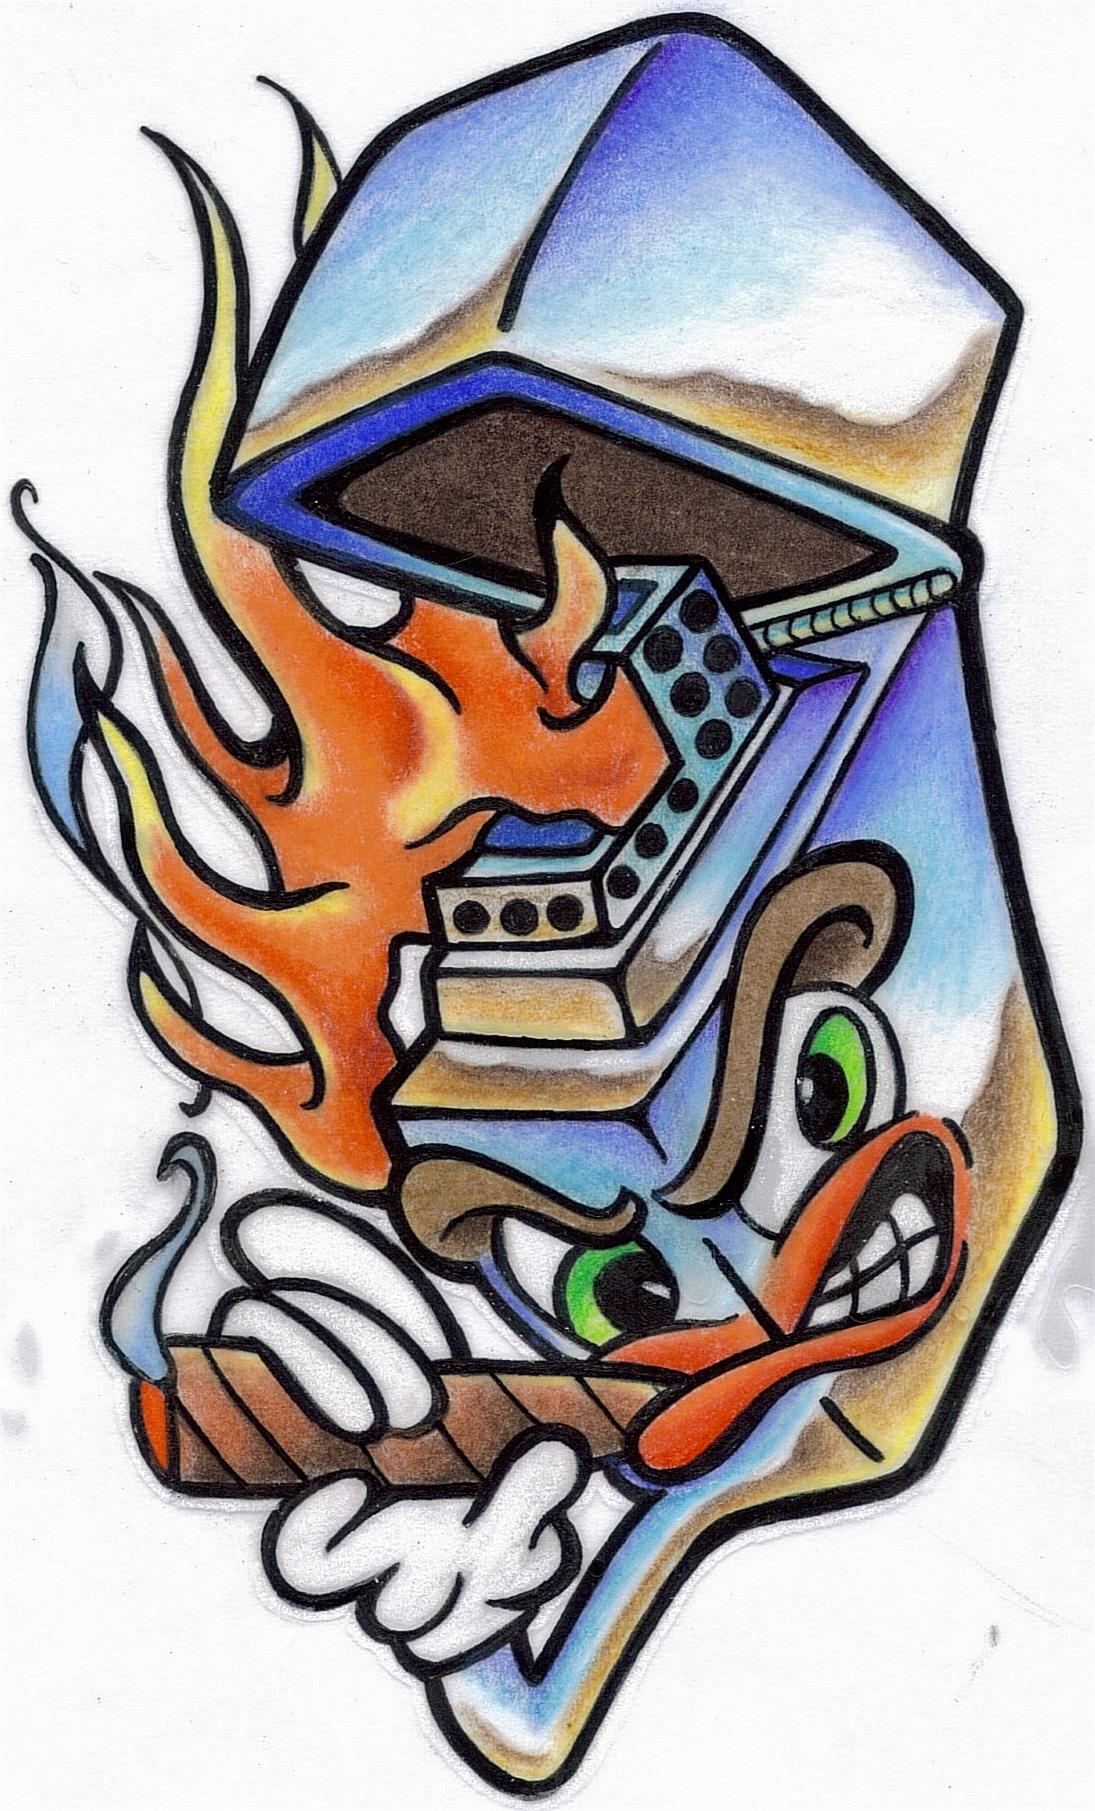 Smoking Robo Head Graffiti Tattoo Design